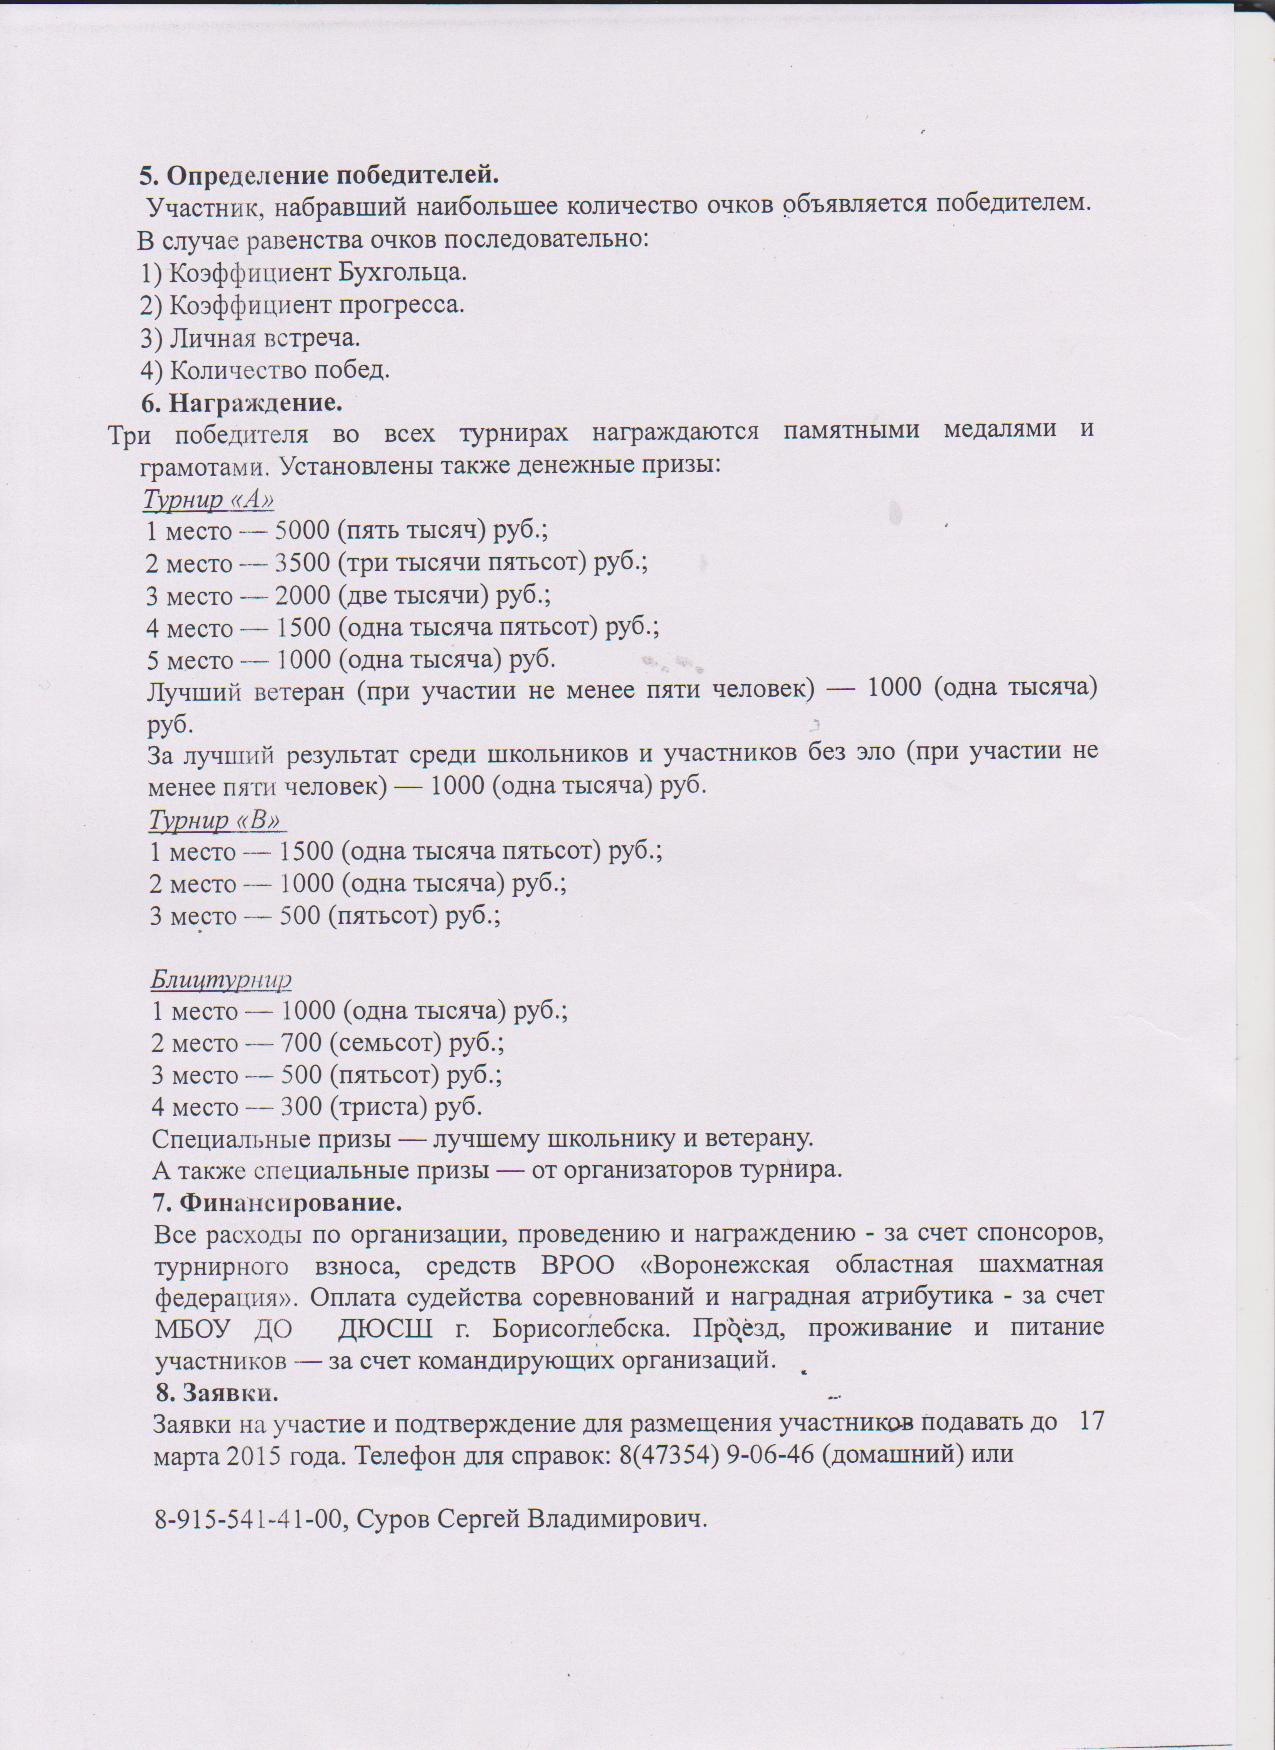 http://se.uploads.ru/E9yHA.jpg